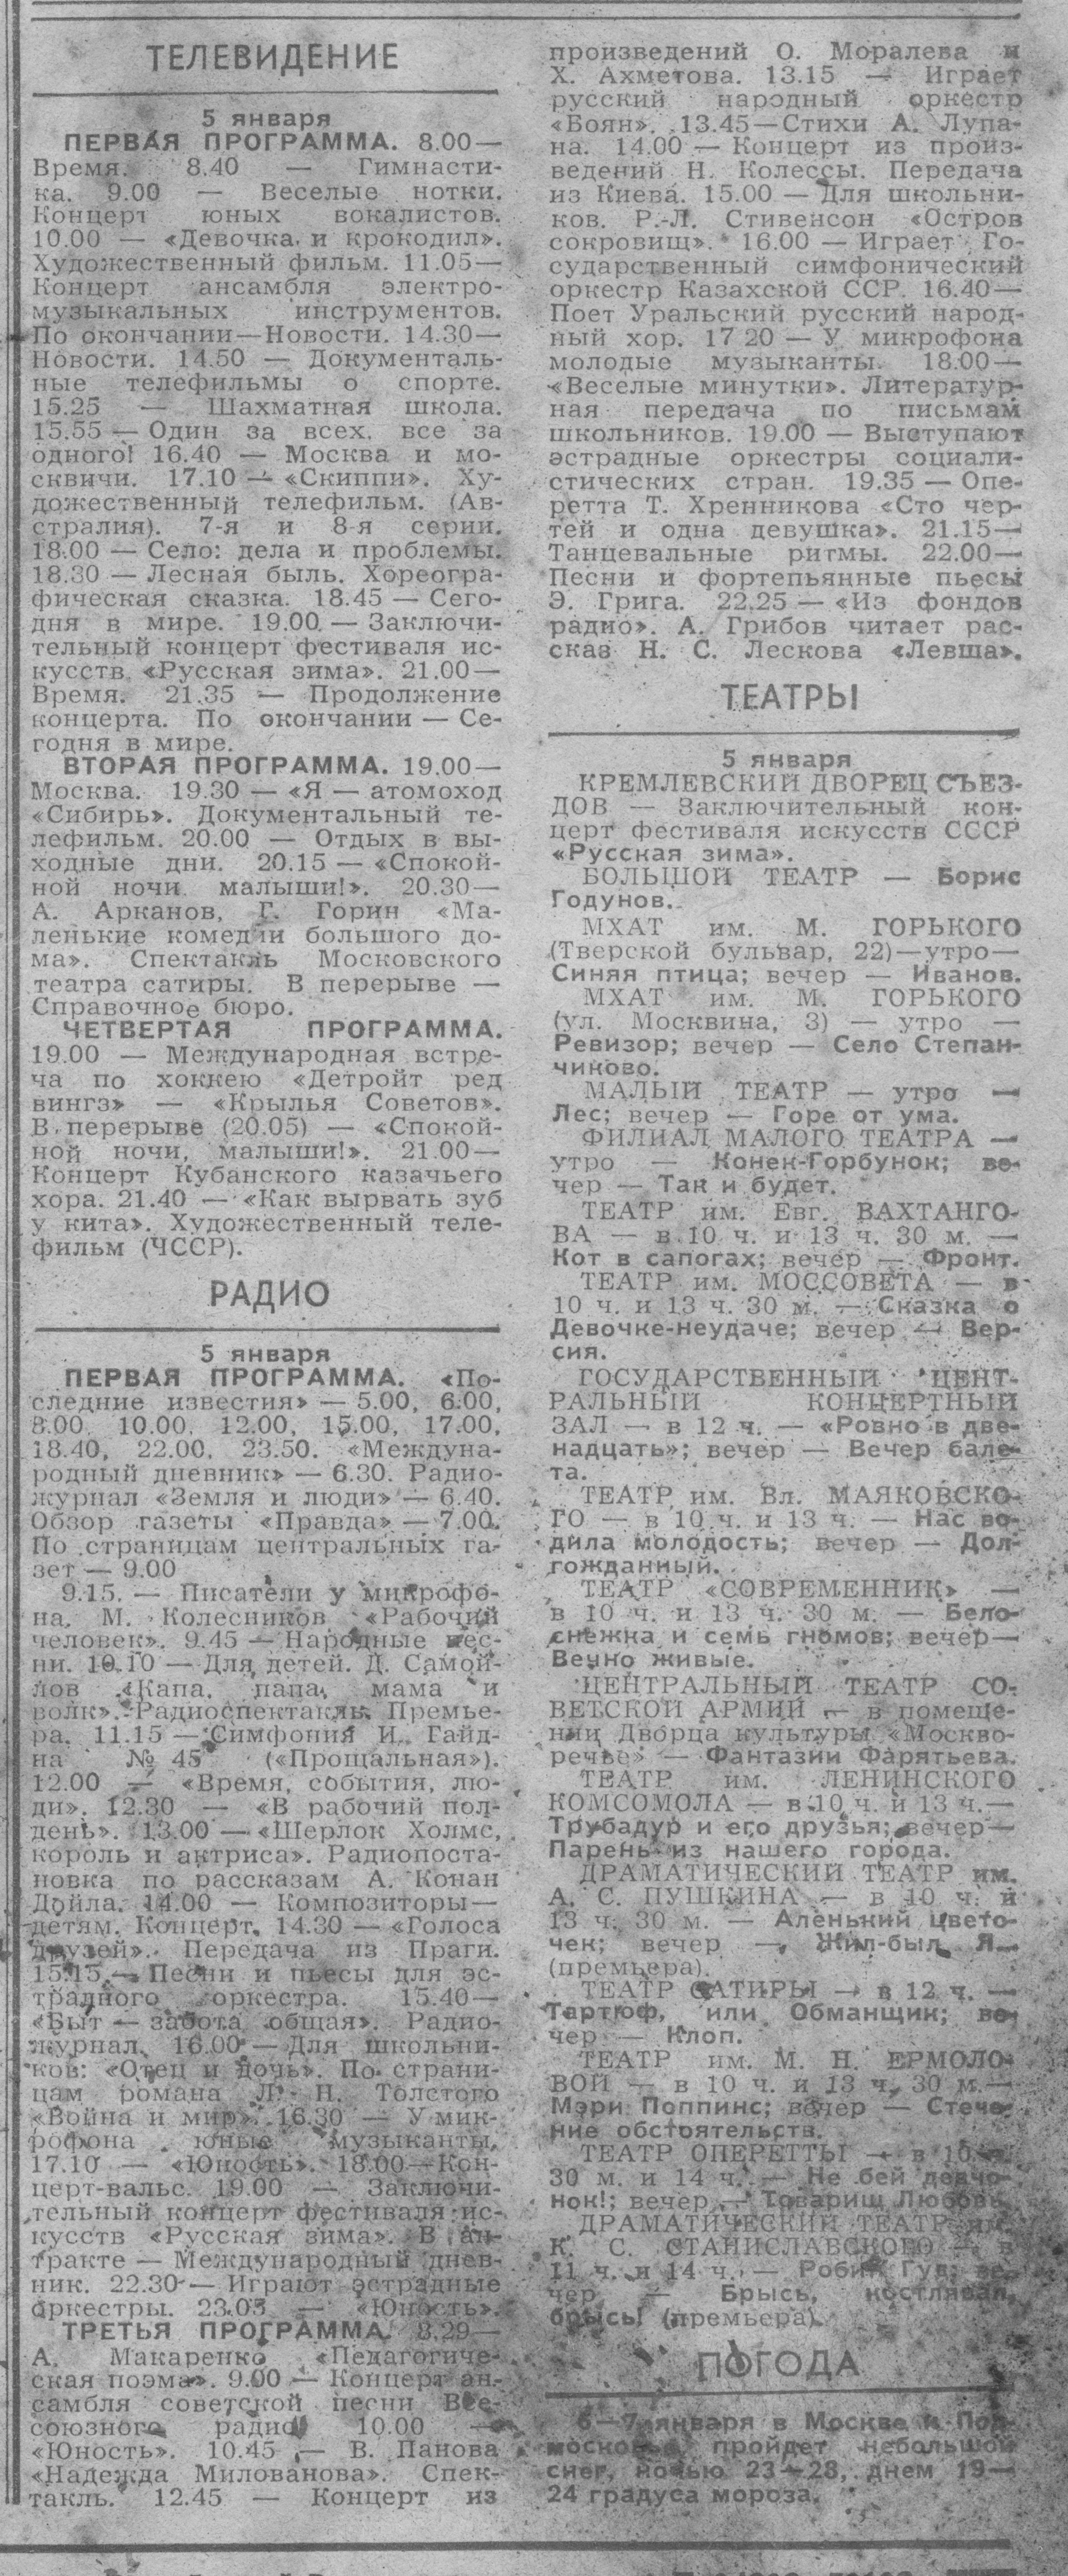 программа передач в правде 5 января 1979 года